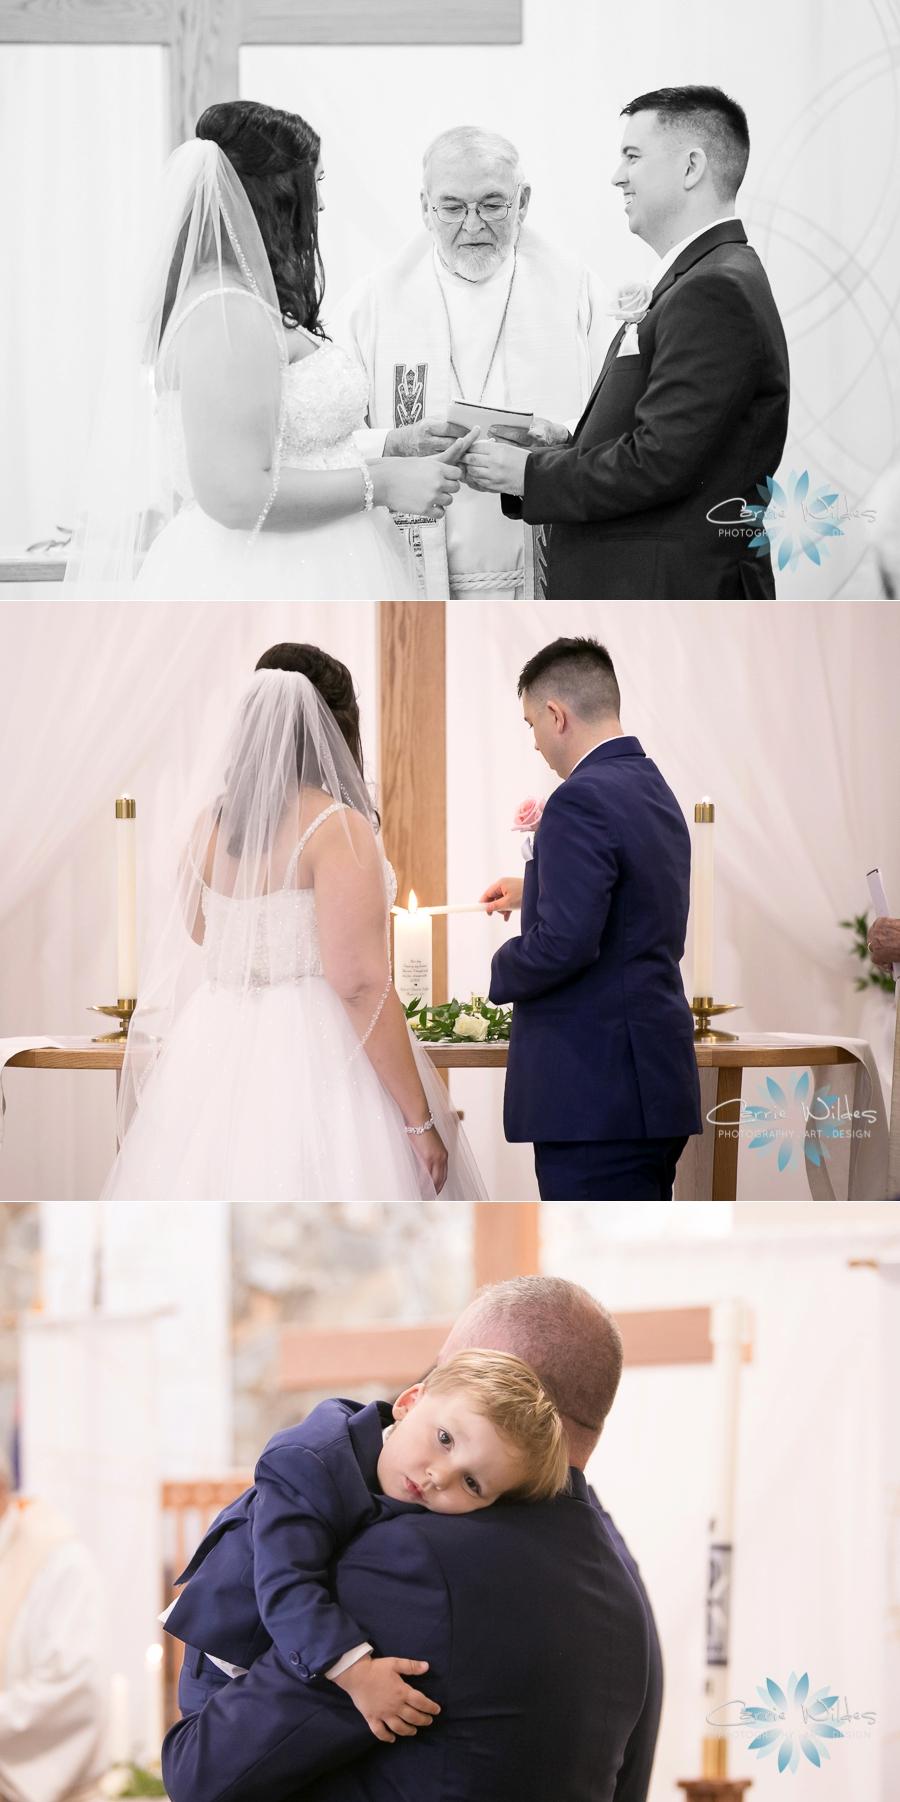 8_4_18 Charlie and Julie Bon Apetit Dunedin Wedding_0027.jpg